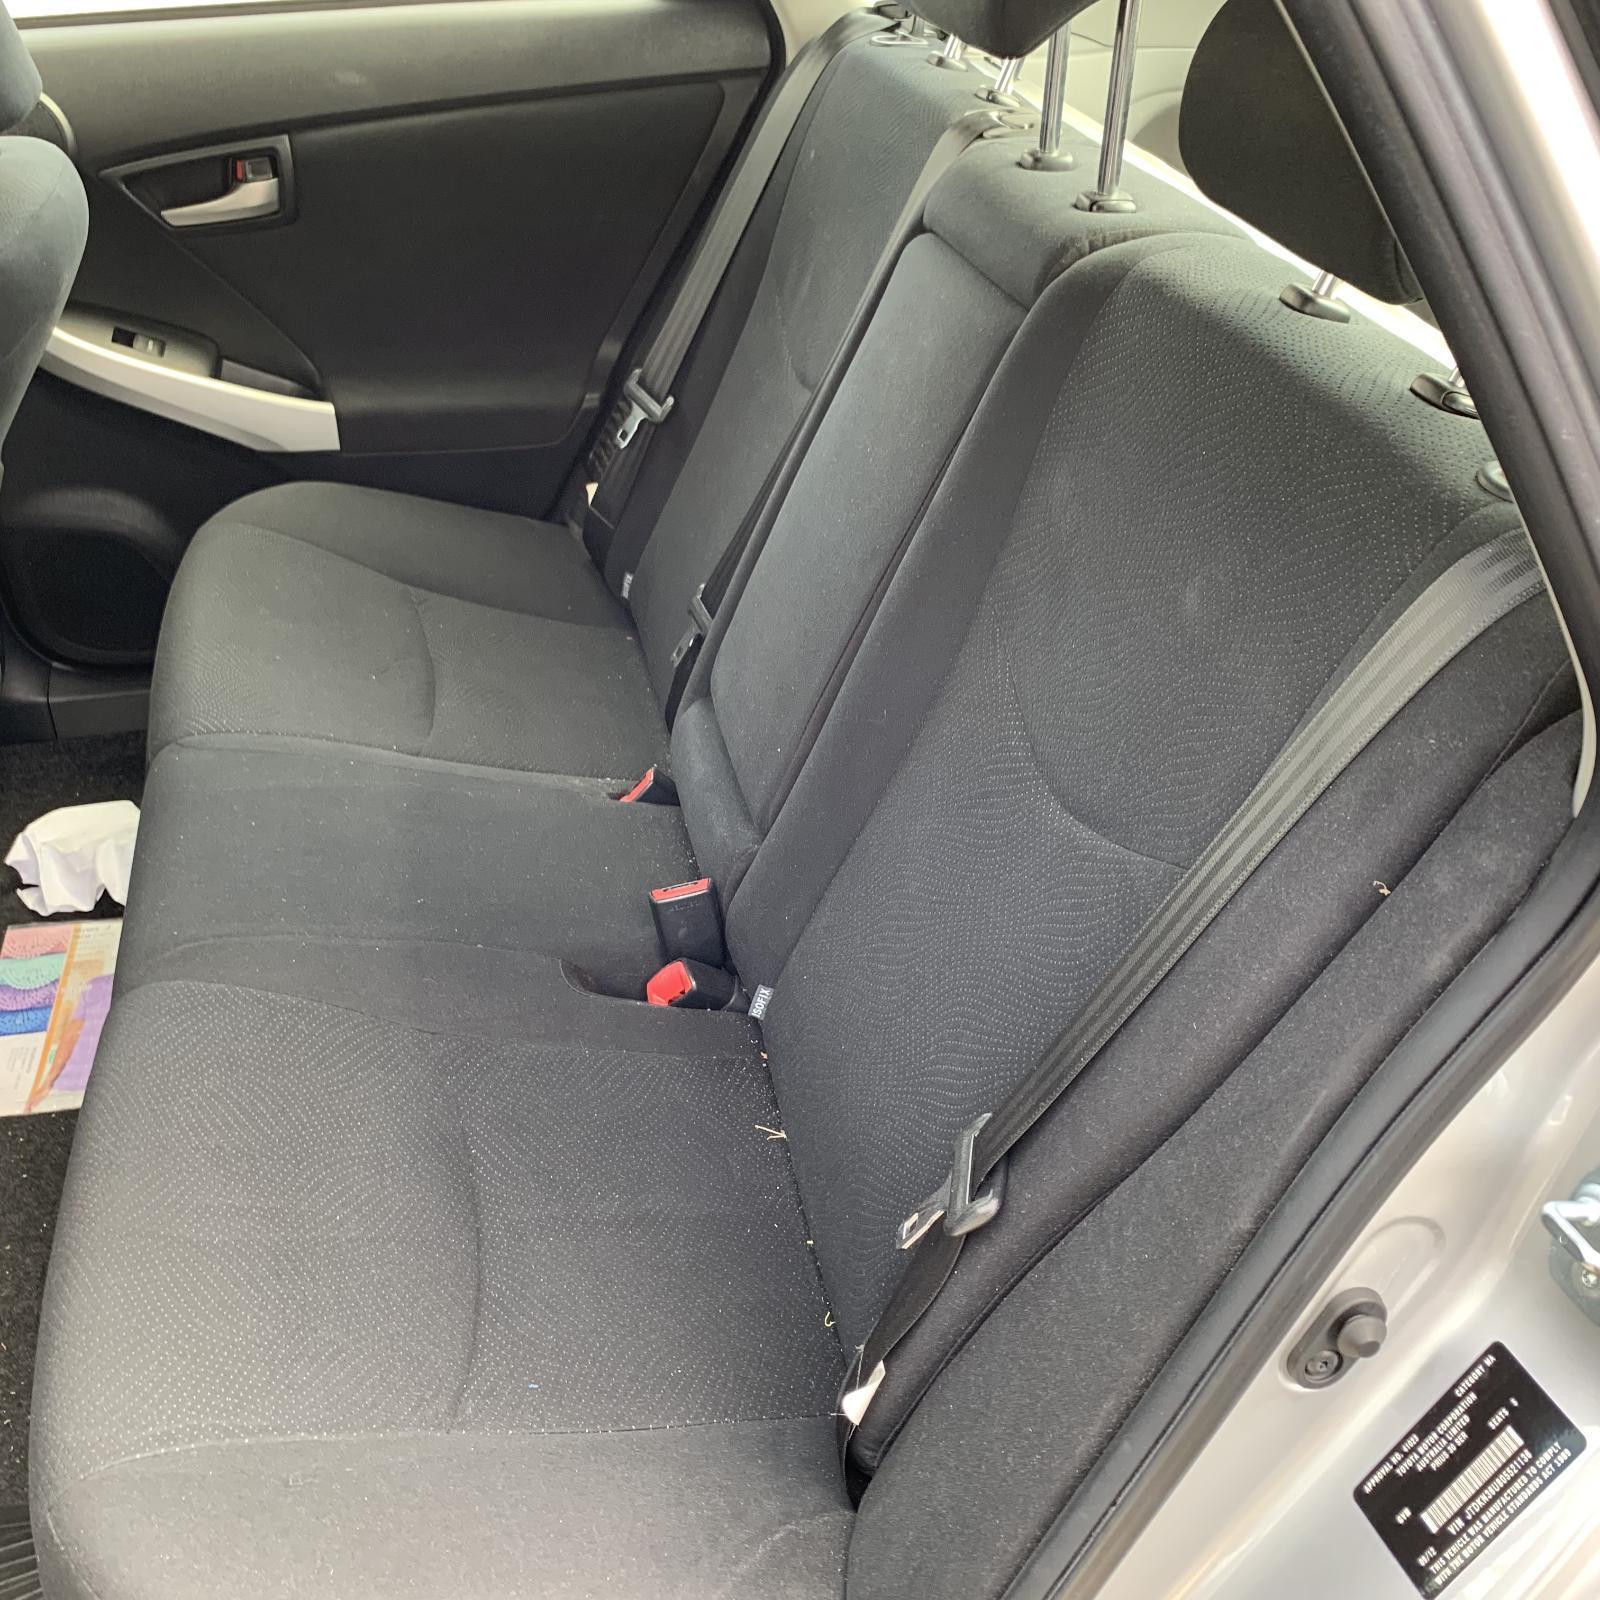 TOYOTA PRIUS, 2nd Seat (Rear Seat), RH REAR, ZVW30R, CLOTH, GREY, 07/09-12/15